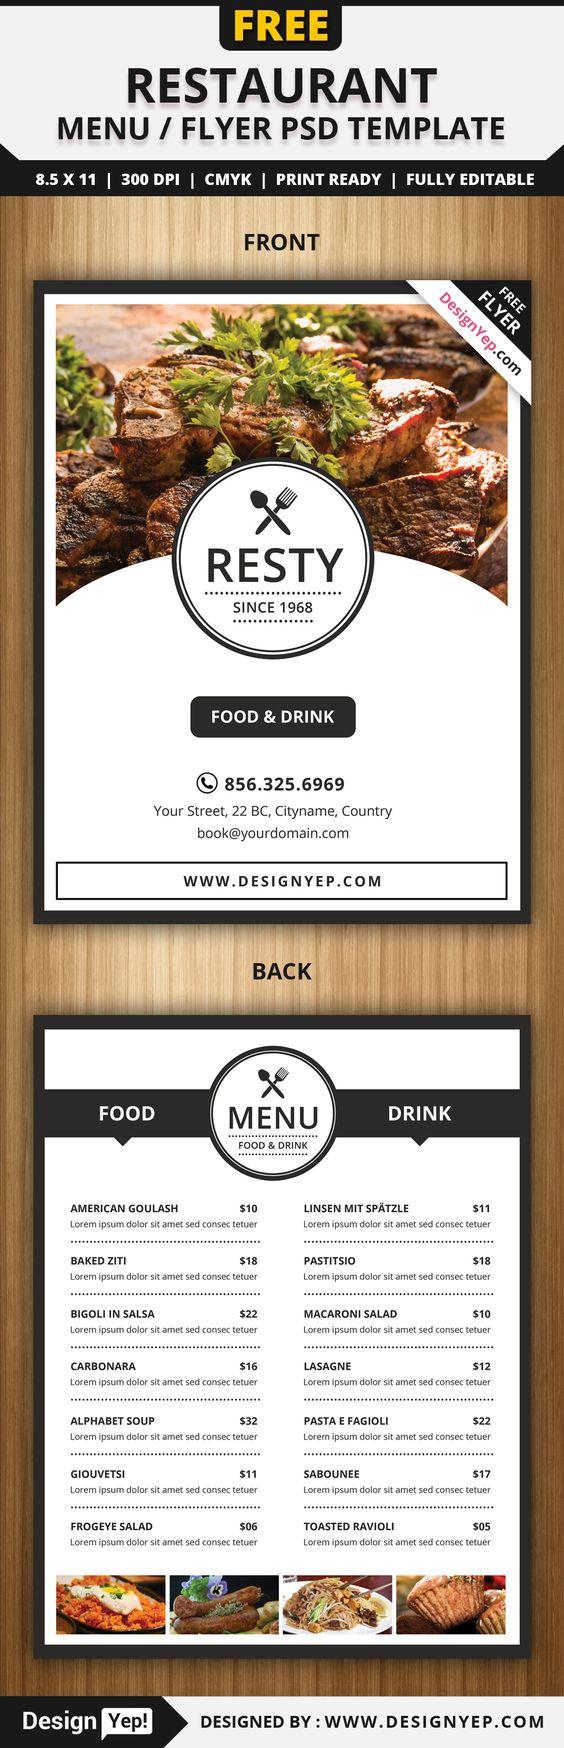 Free Restaurant Menu / Flyer PSD Template Free Flyers